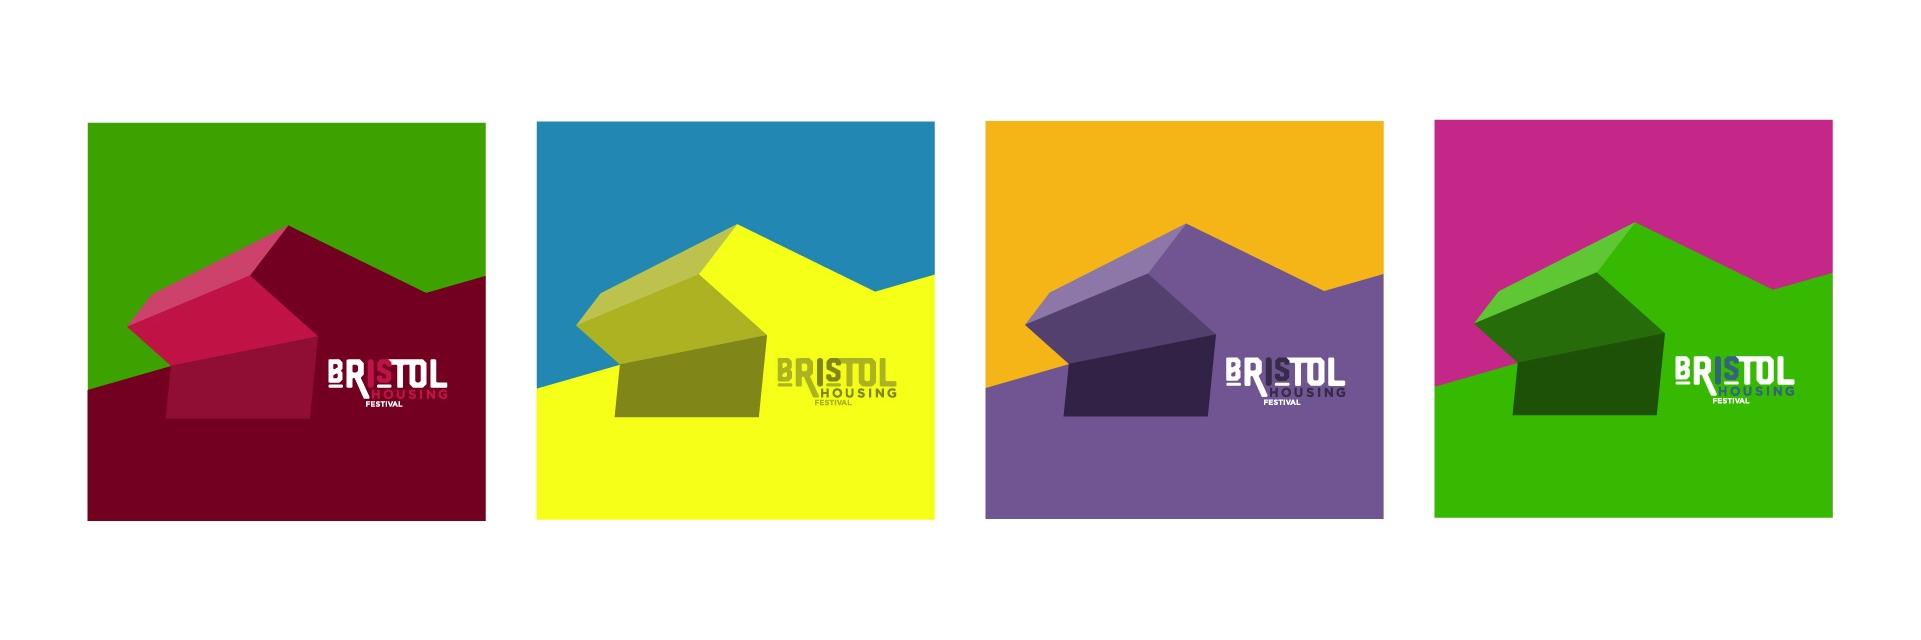 BrandPresentation2-20.jpg